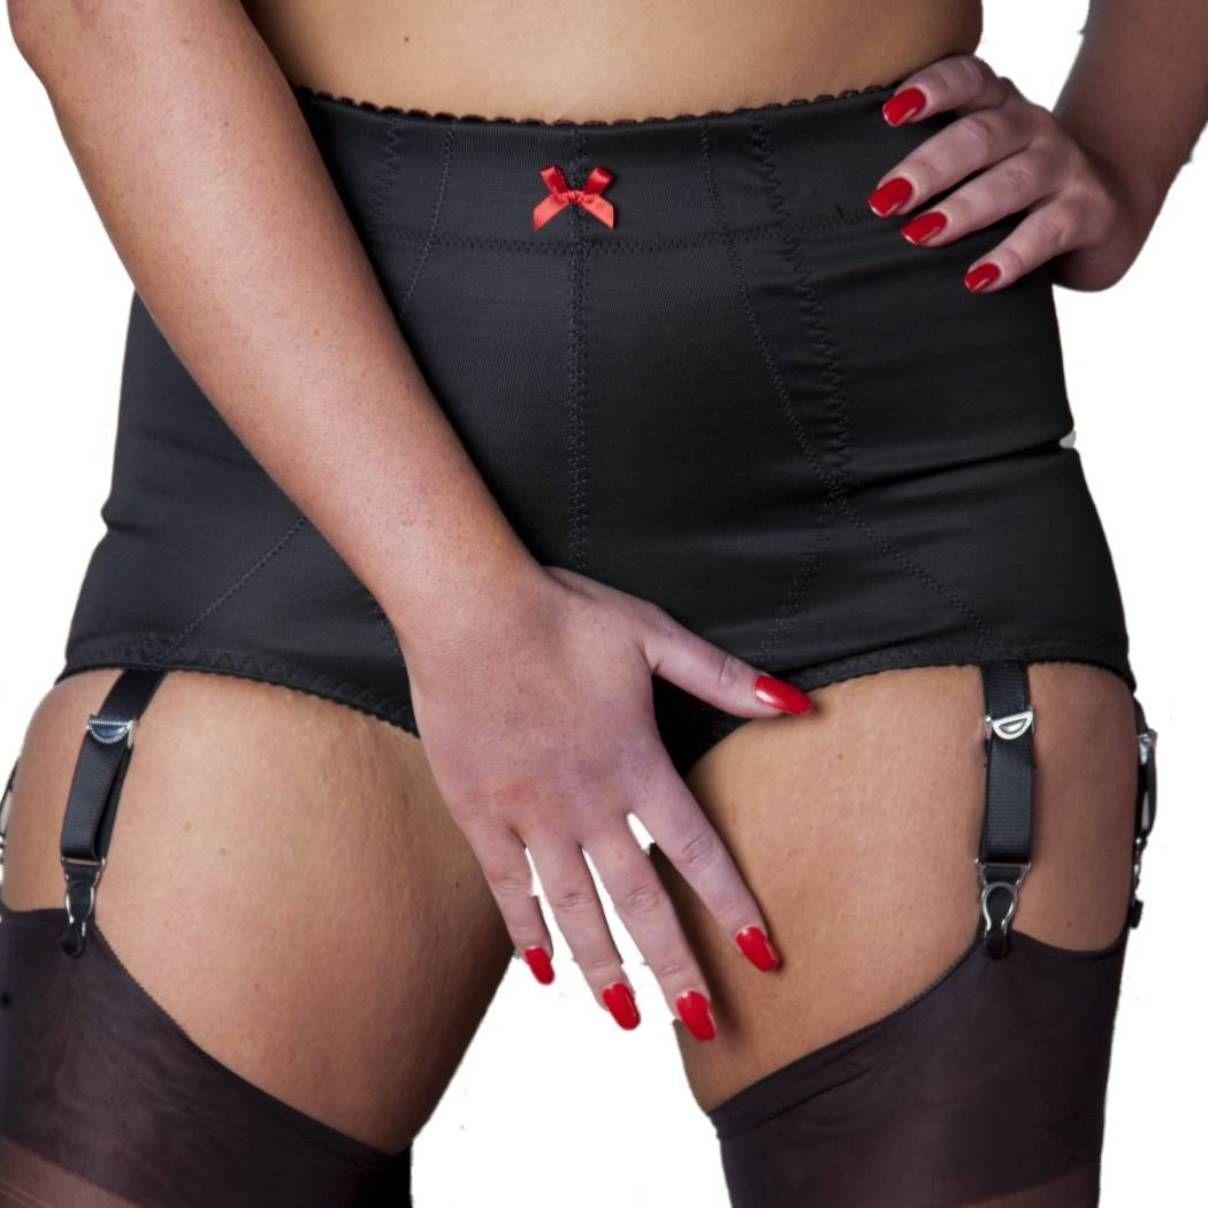 1bb4de7c109 Premier Lingerie 6 Strap Crotchless Shapewear Girdle With Garters (Ndcg6Usa)